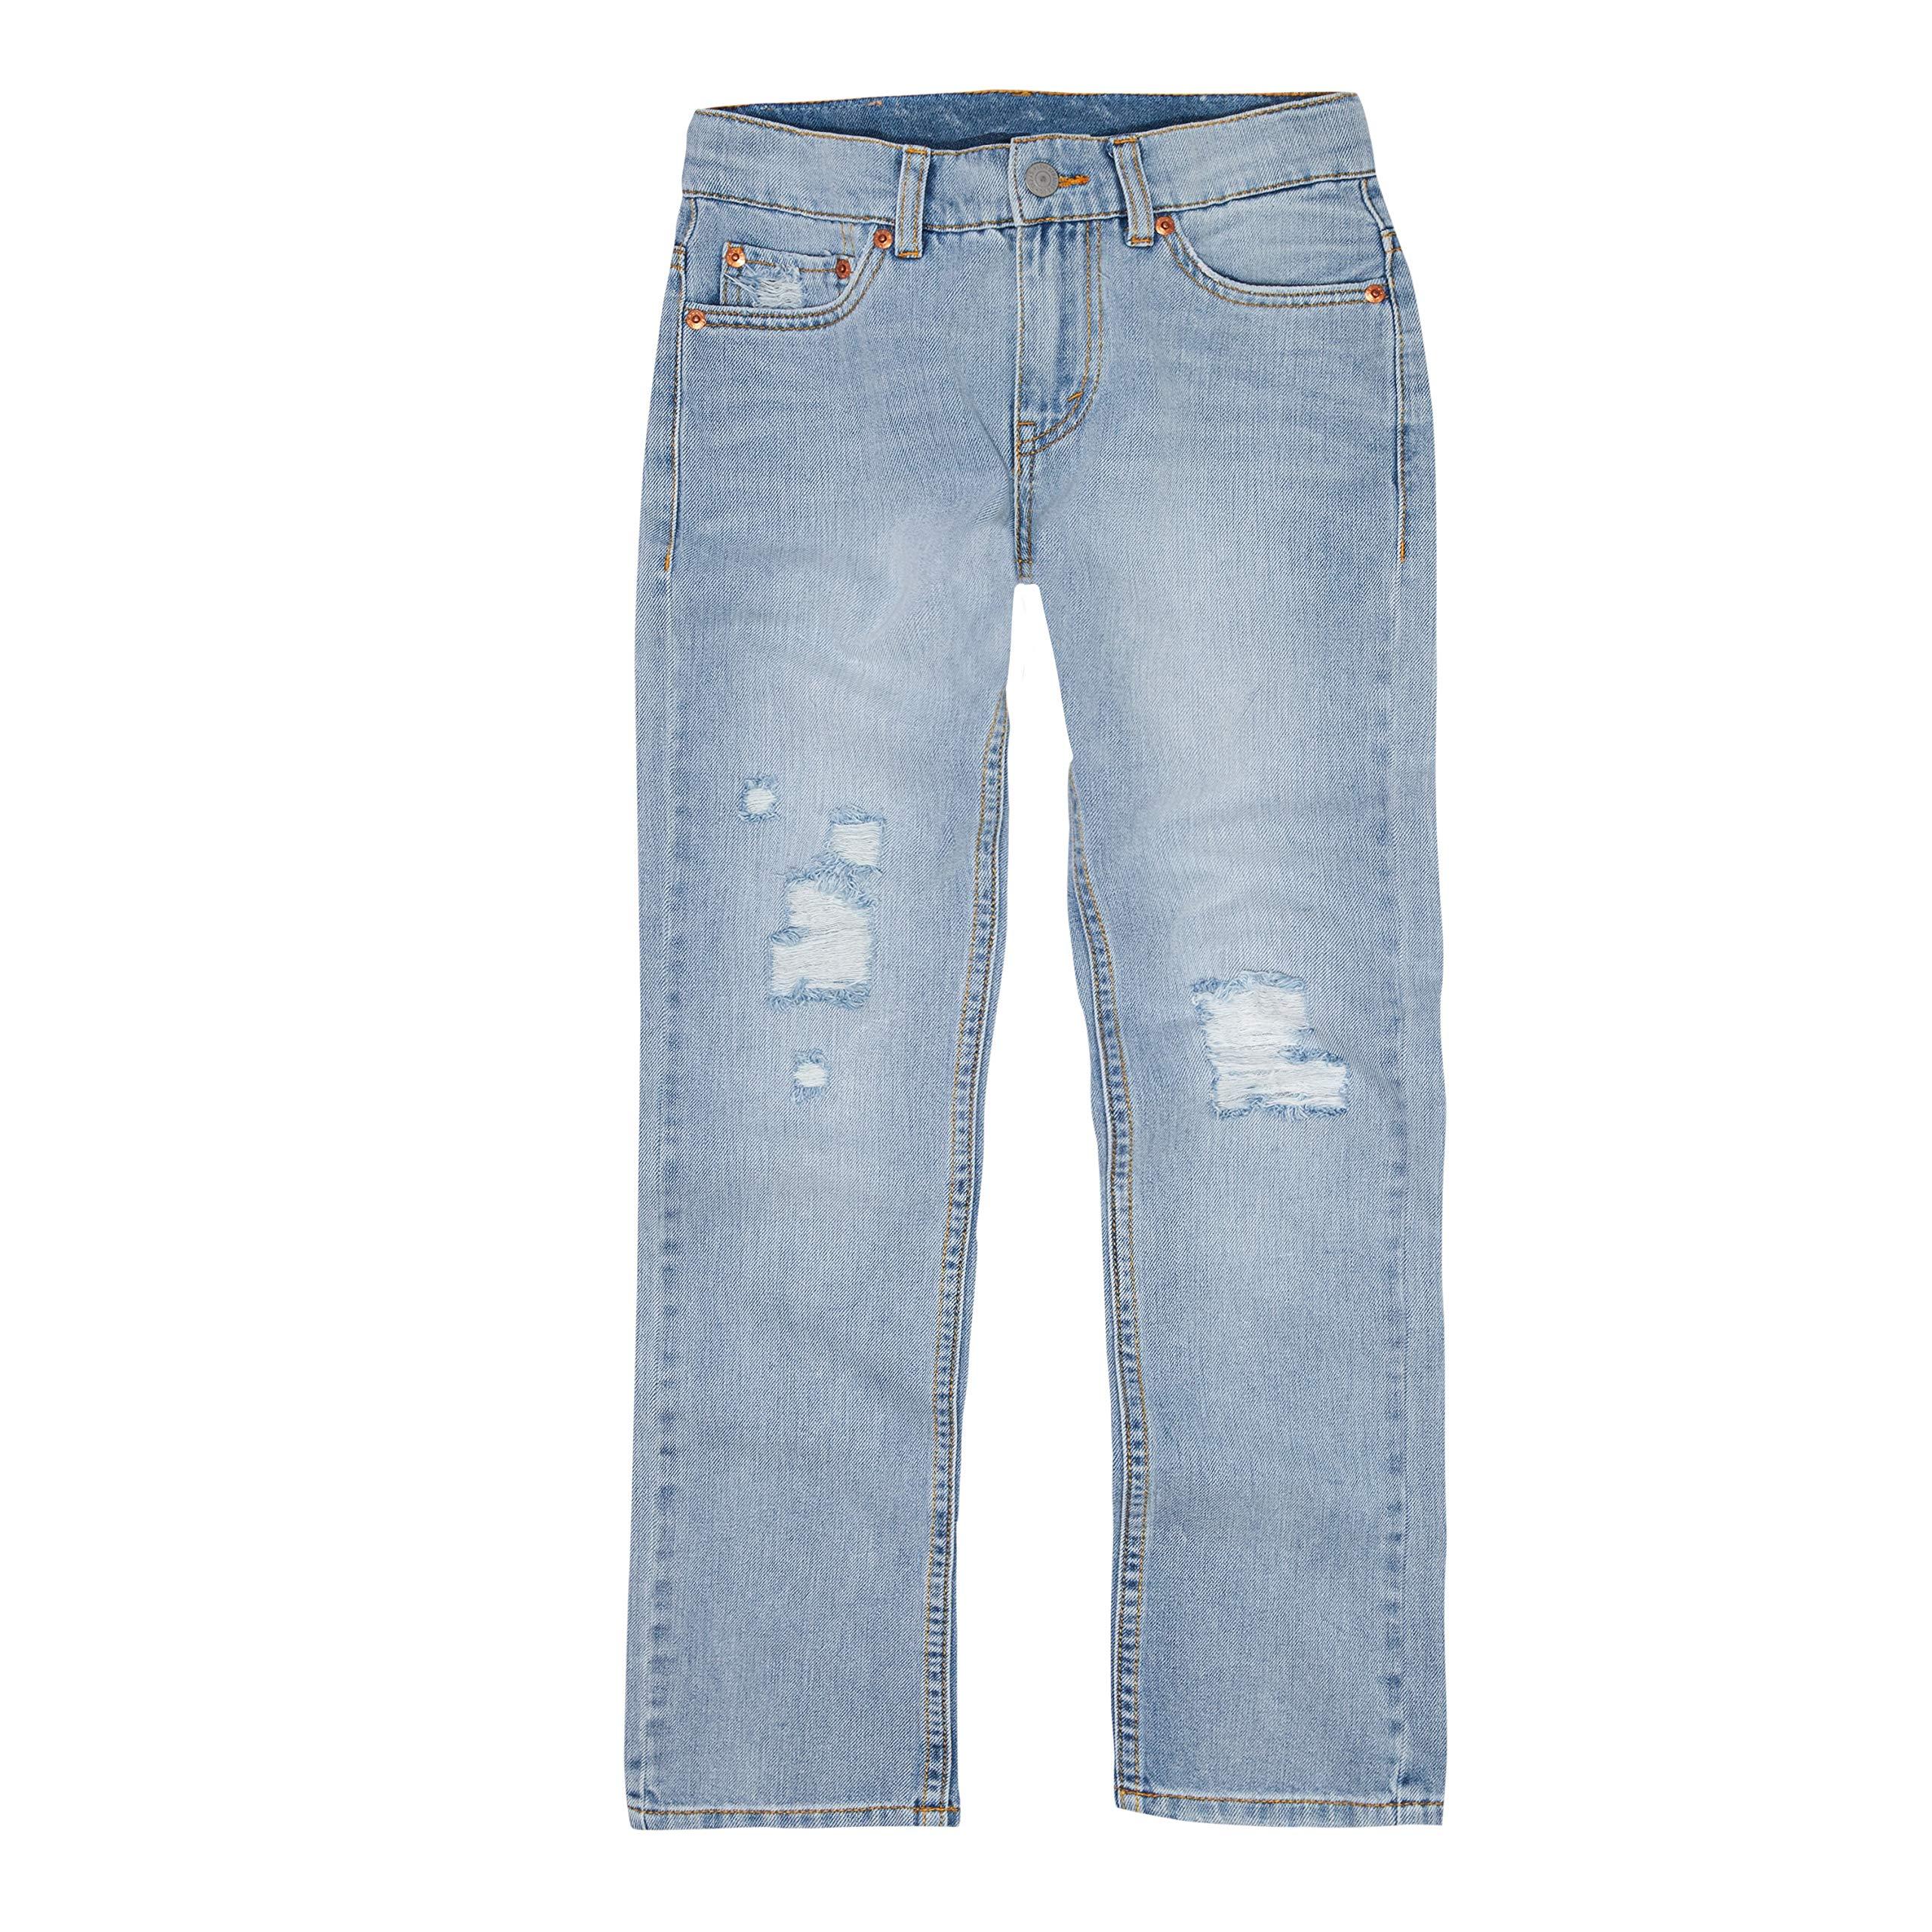 Levi's Boys' Big 511 Slim Fit Performance Jeans, Abbot Kinney Destructed, 10